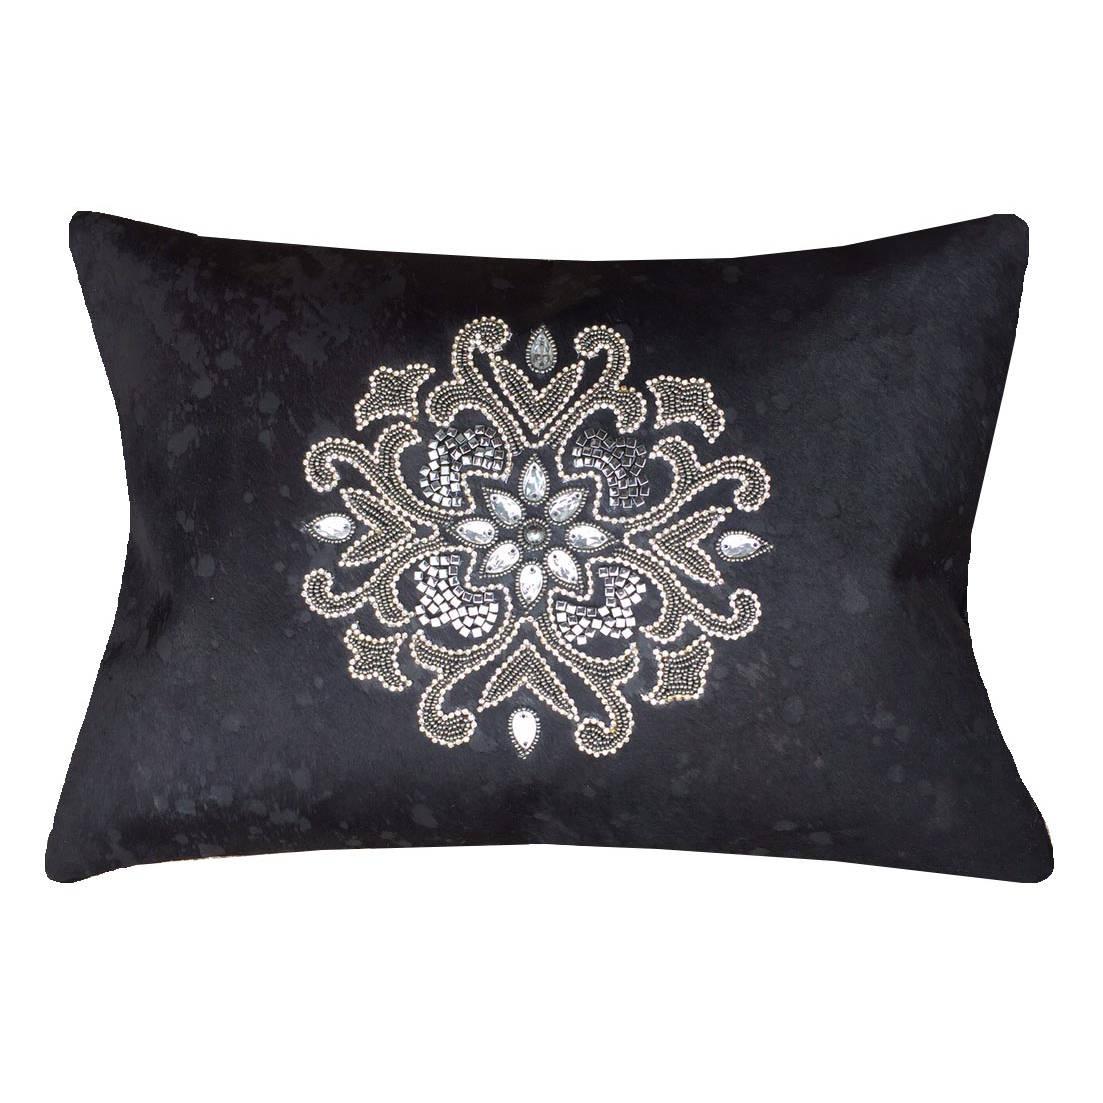 Decorative pillows hairon hide acid wash creations.